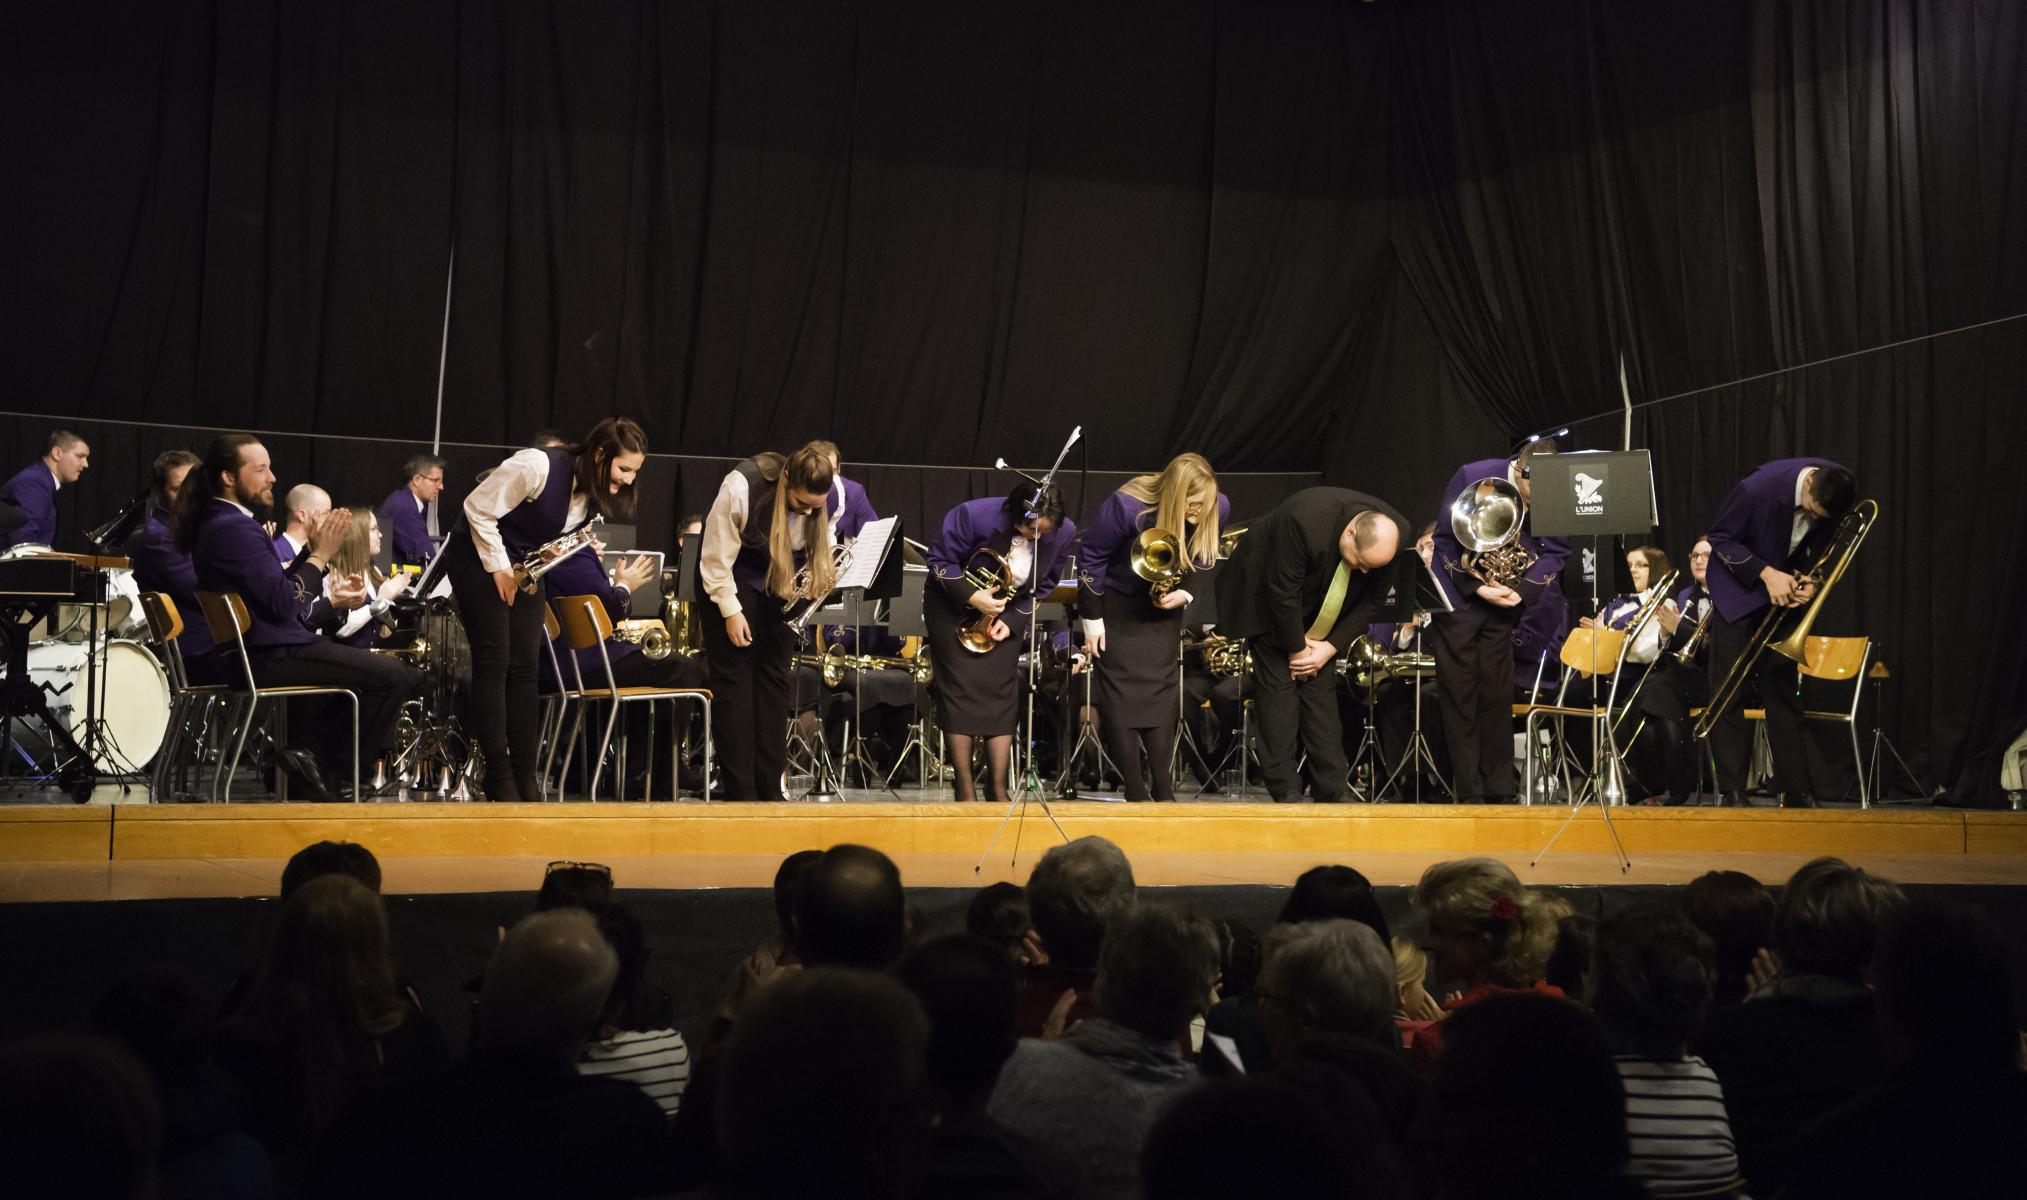 170211_concert_annuel17-056